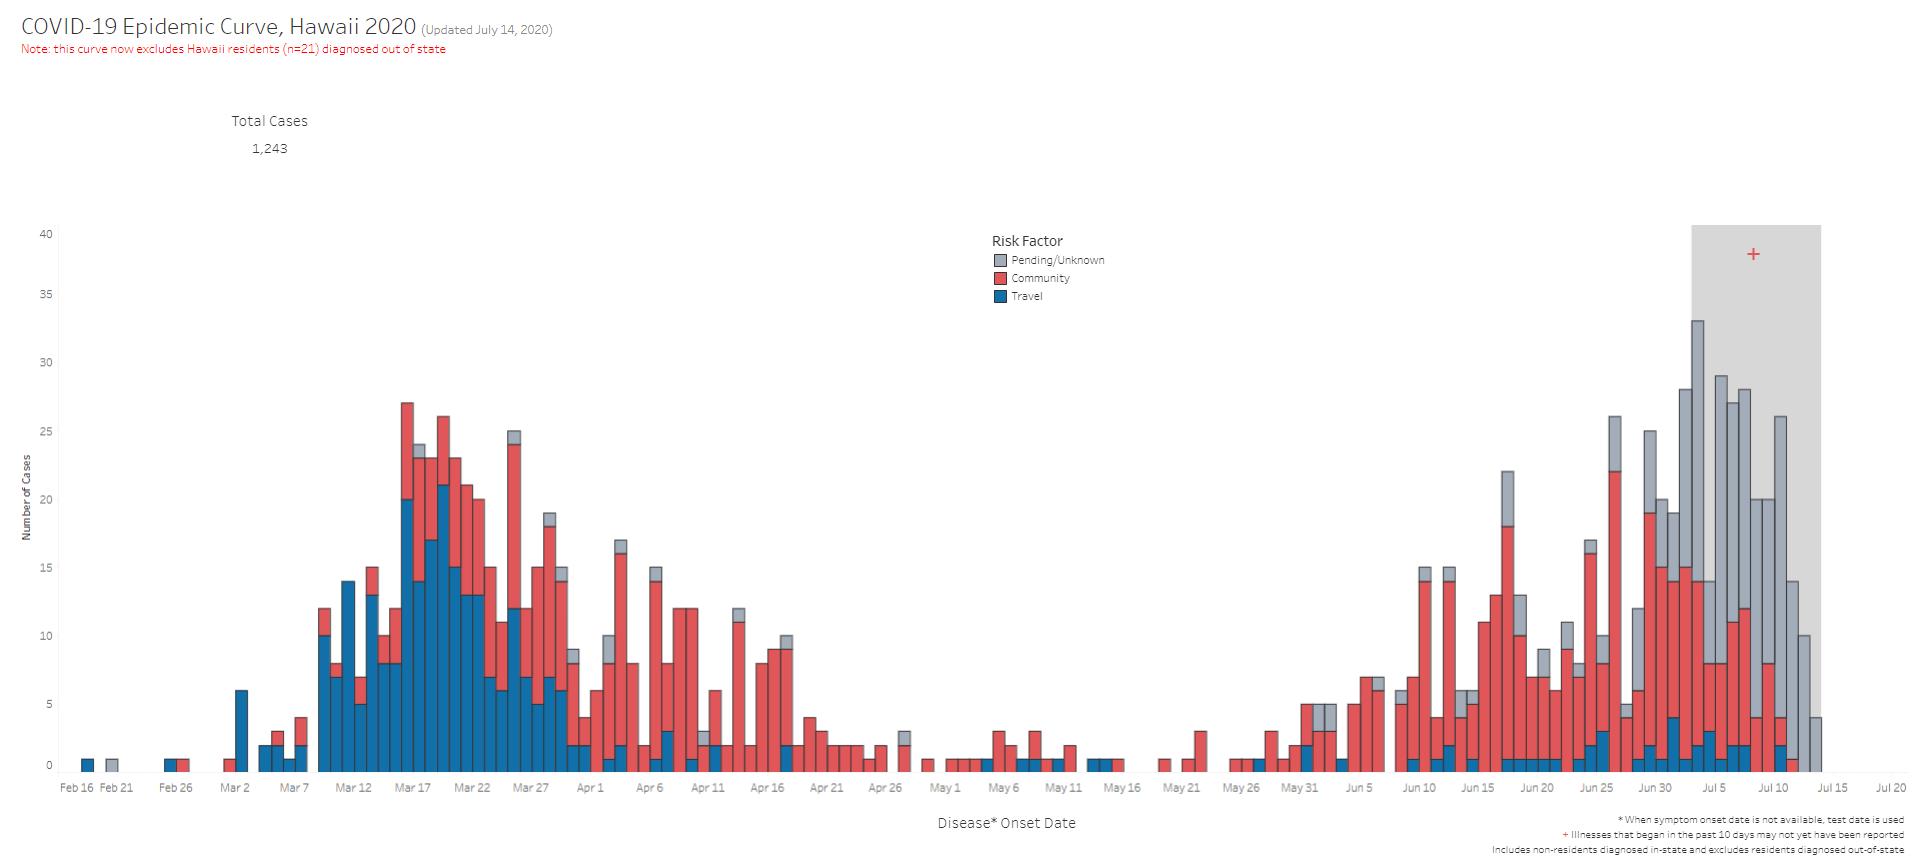 COVID-19 Epidemic Curve Hawaii July 14, 2020